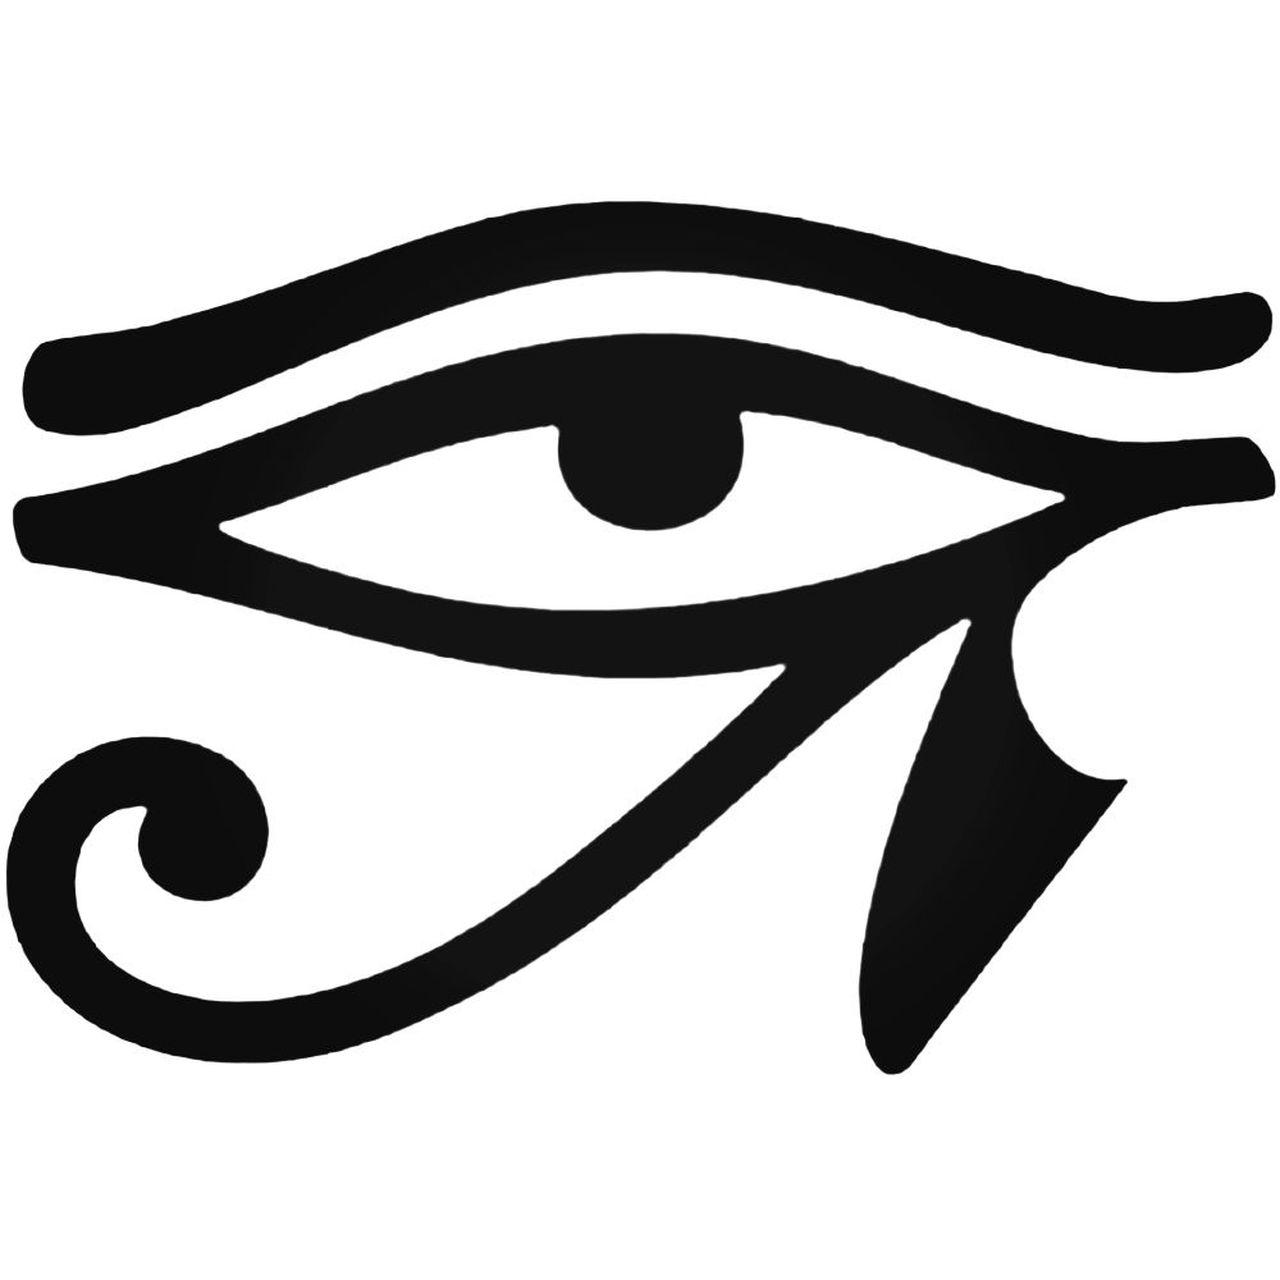 Egyptian Hieroglyphic Eye Of Horus Decal Sticker.